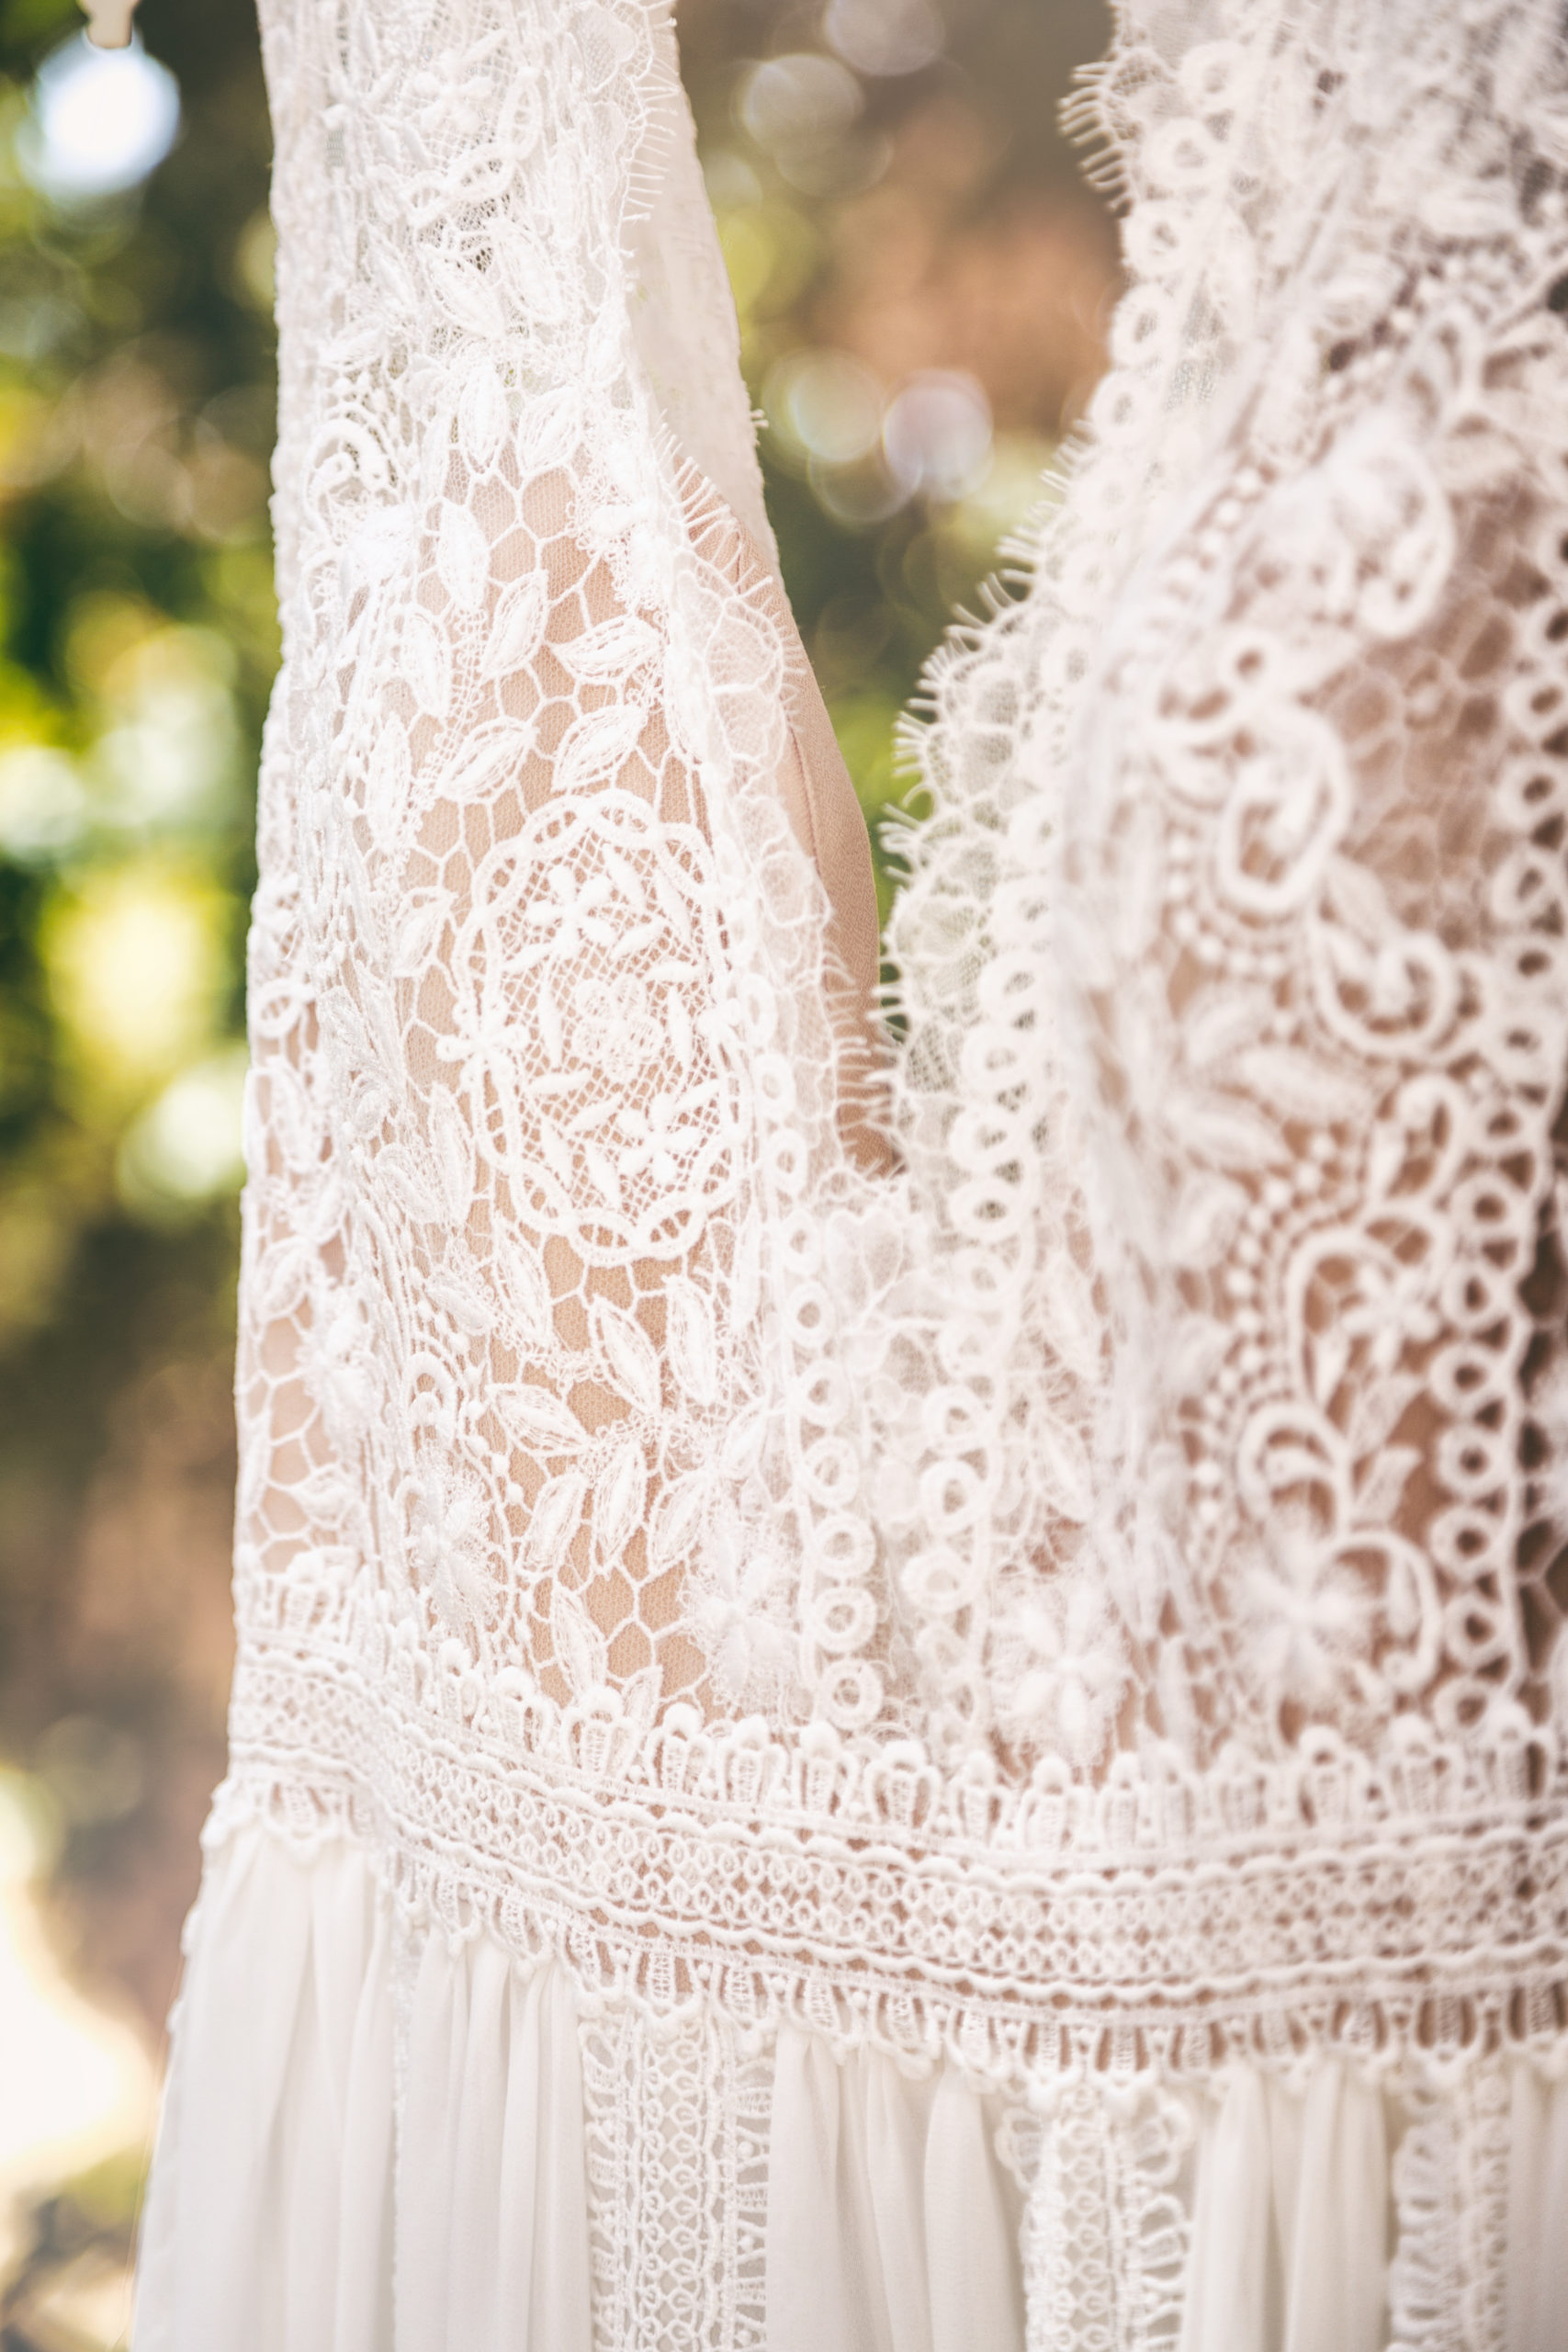 Photographe de mariage, la robe de mariée